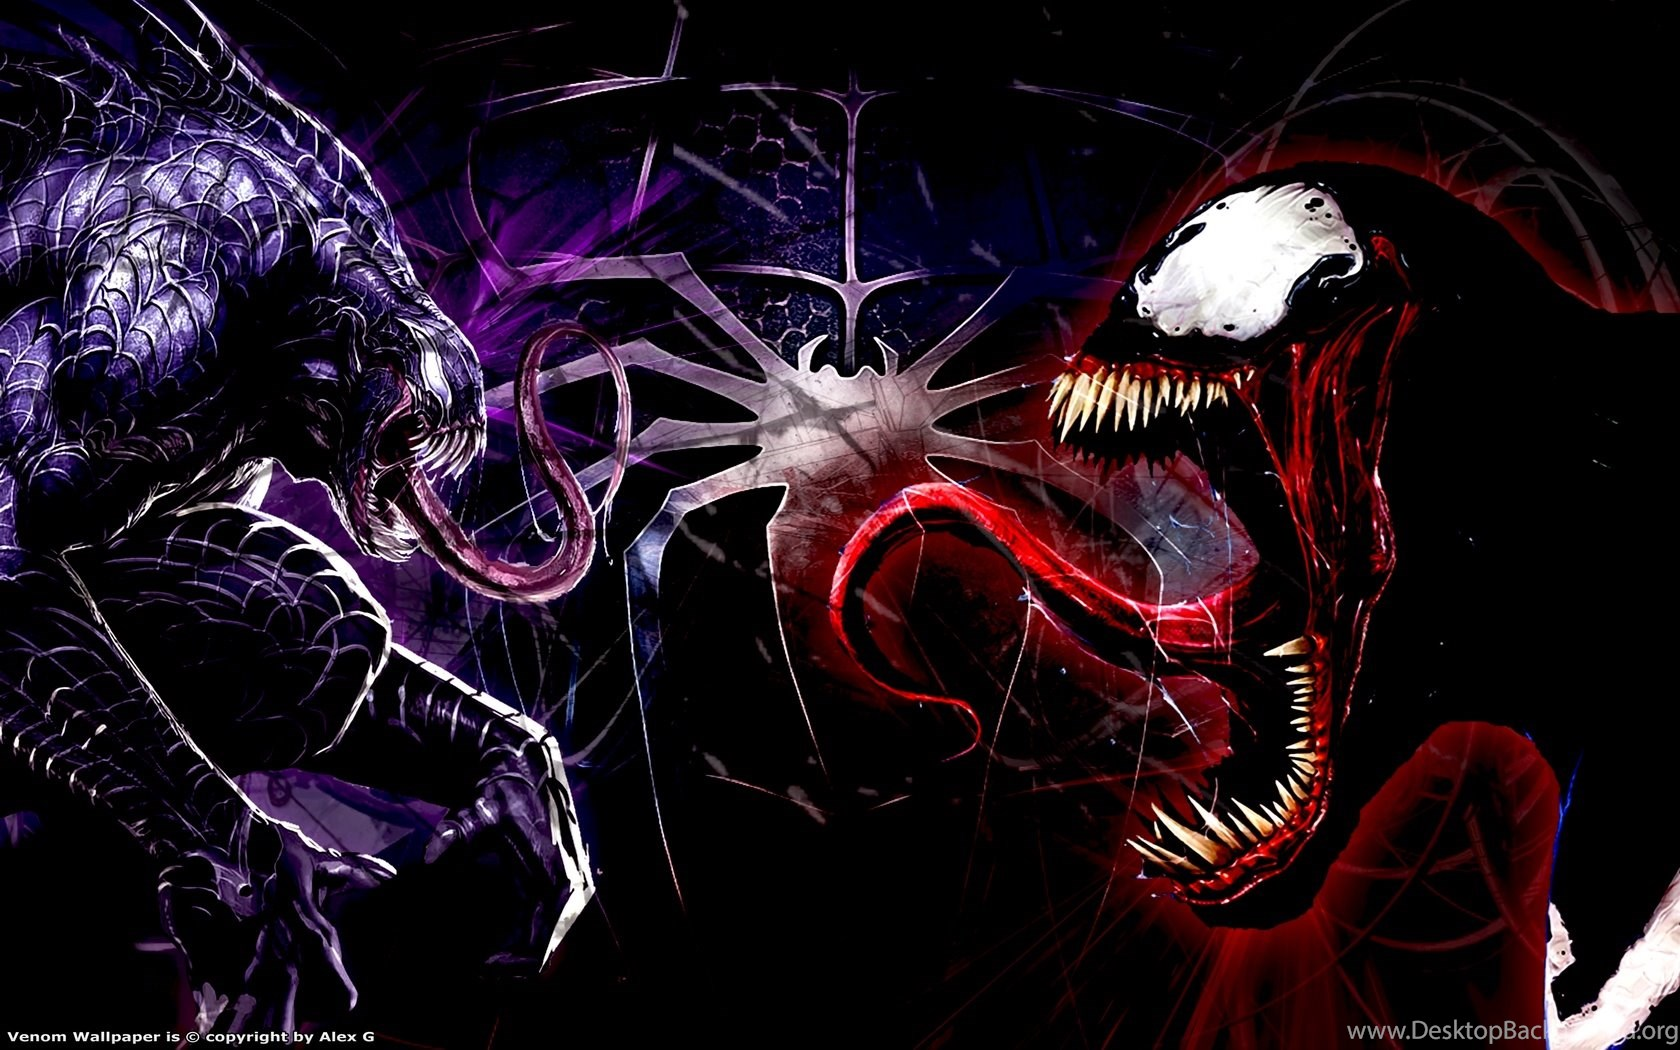 Venom Wallpapers Pictures Images: Venom Vs Carnage Wallpapers